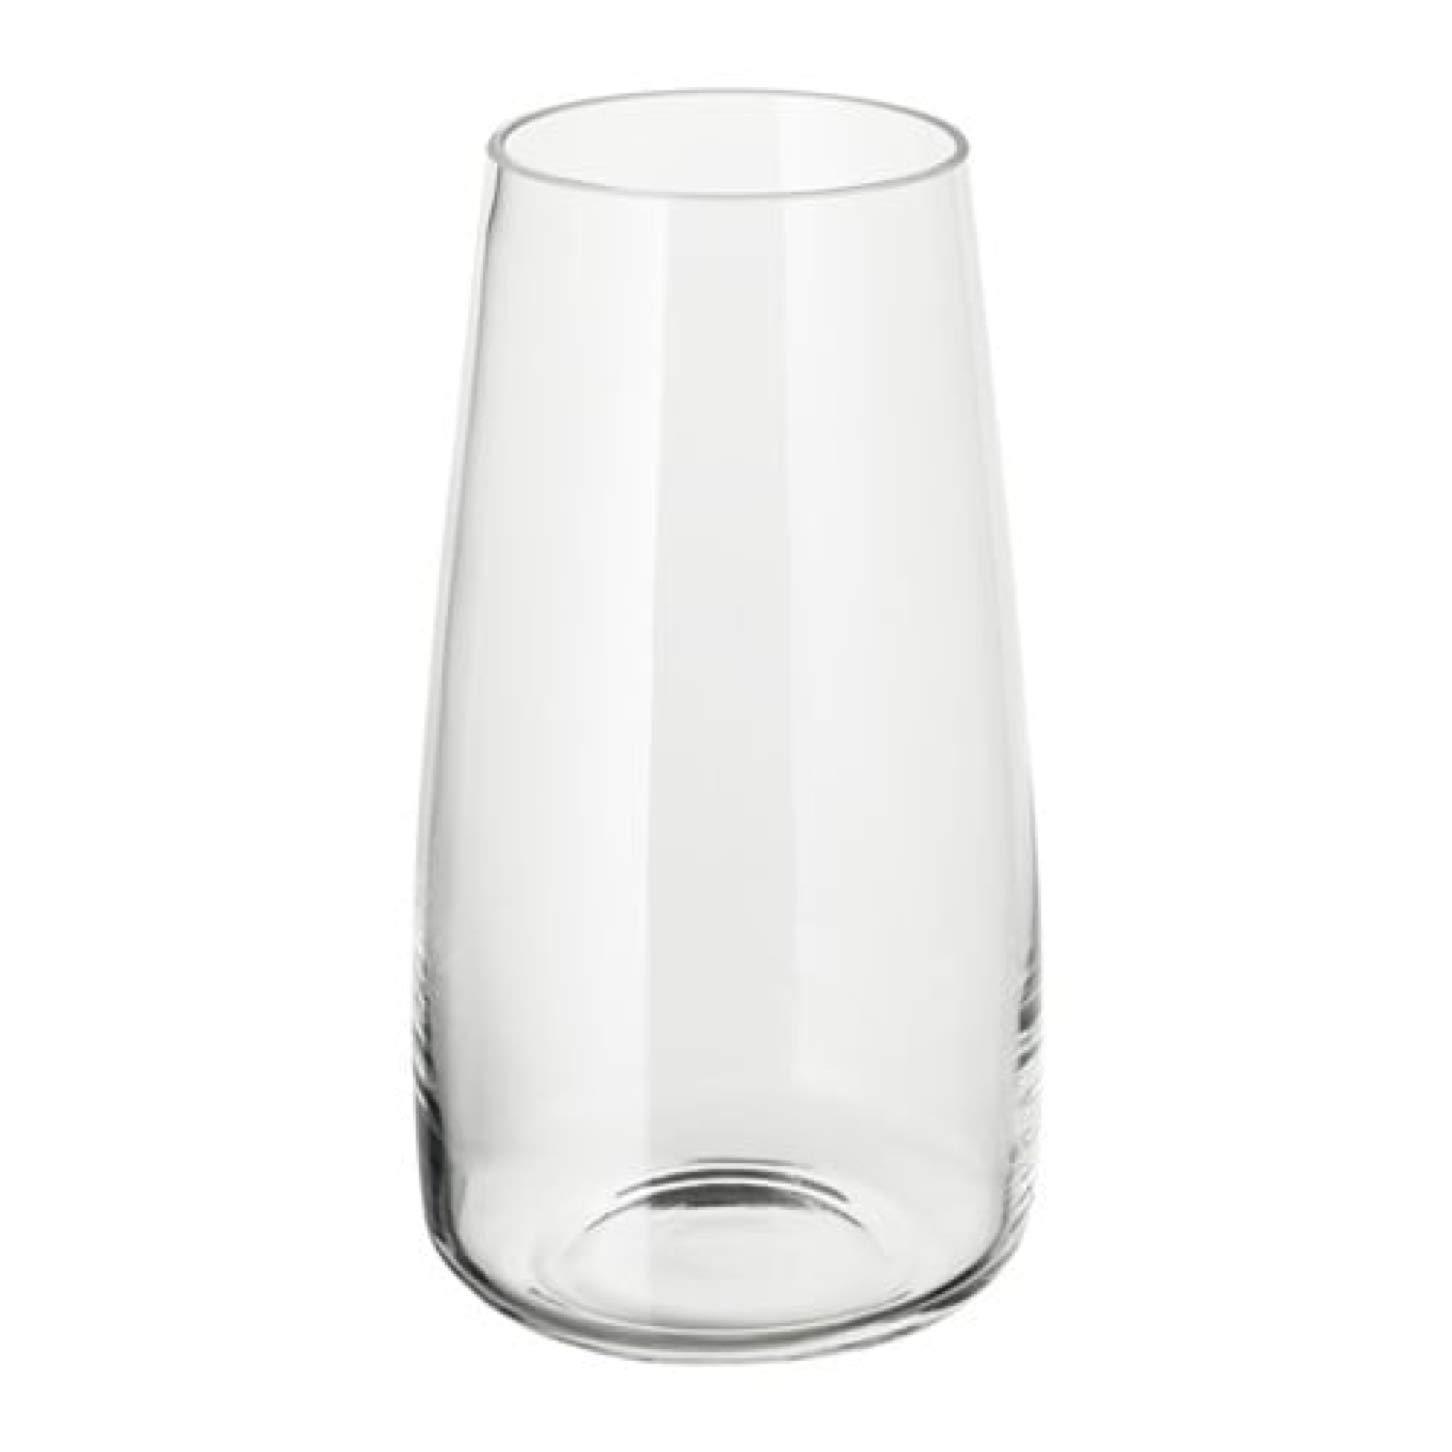 Amazon Com Ikea Berakna Vase Clear Glass 204 062 97 Size 11